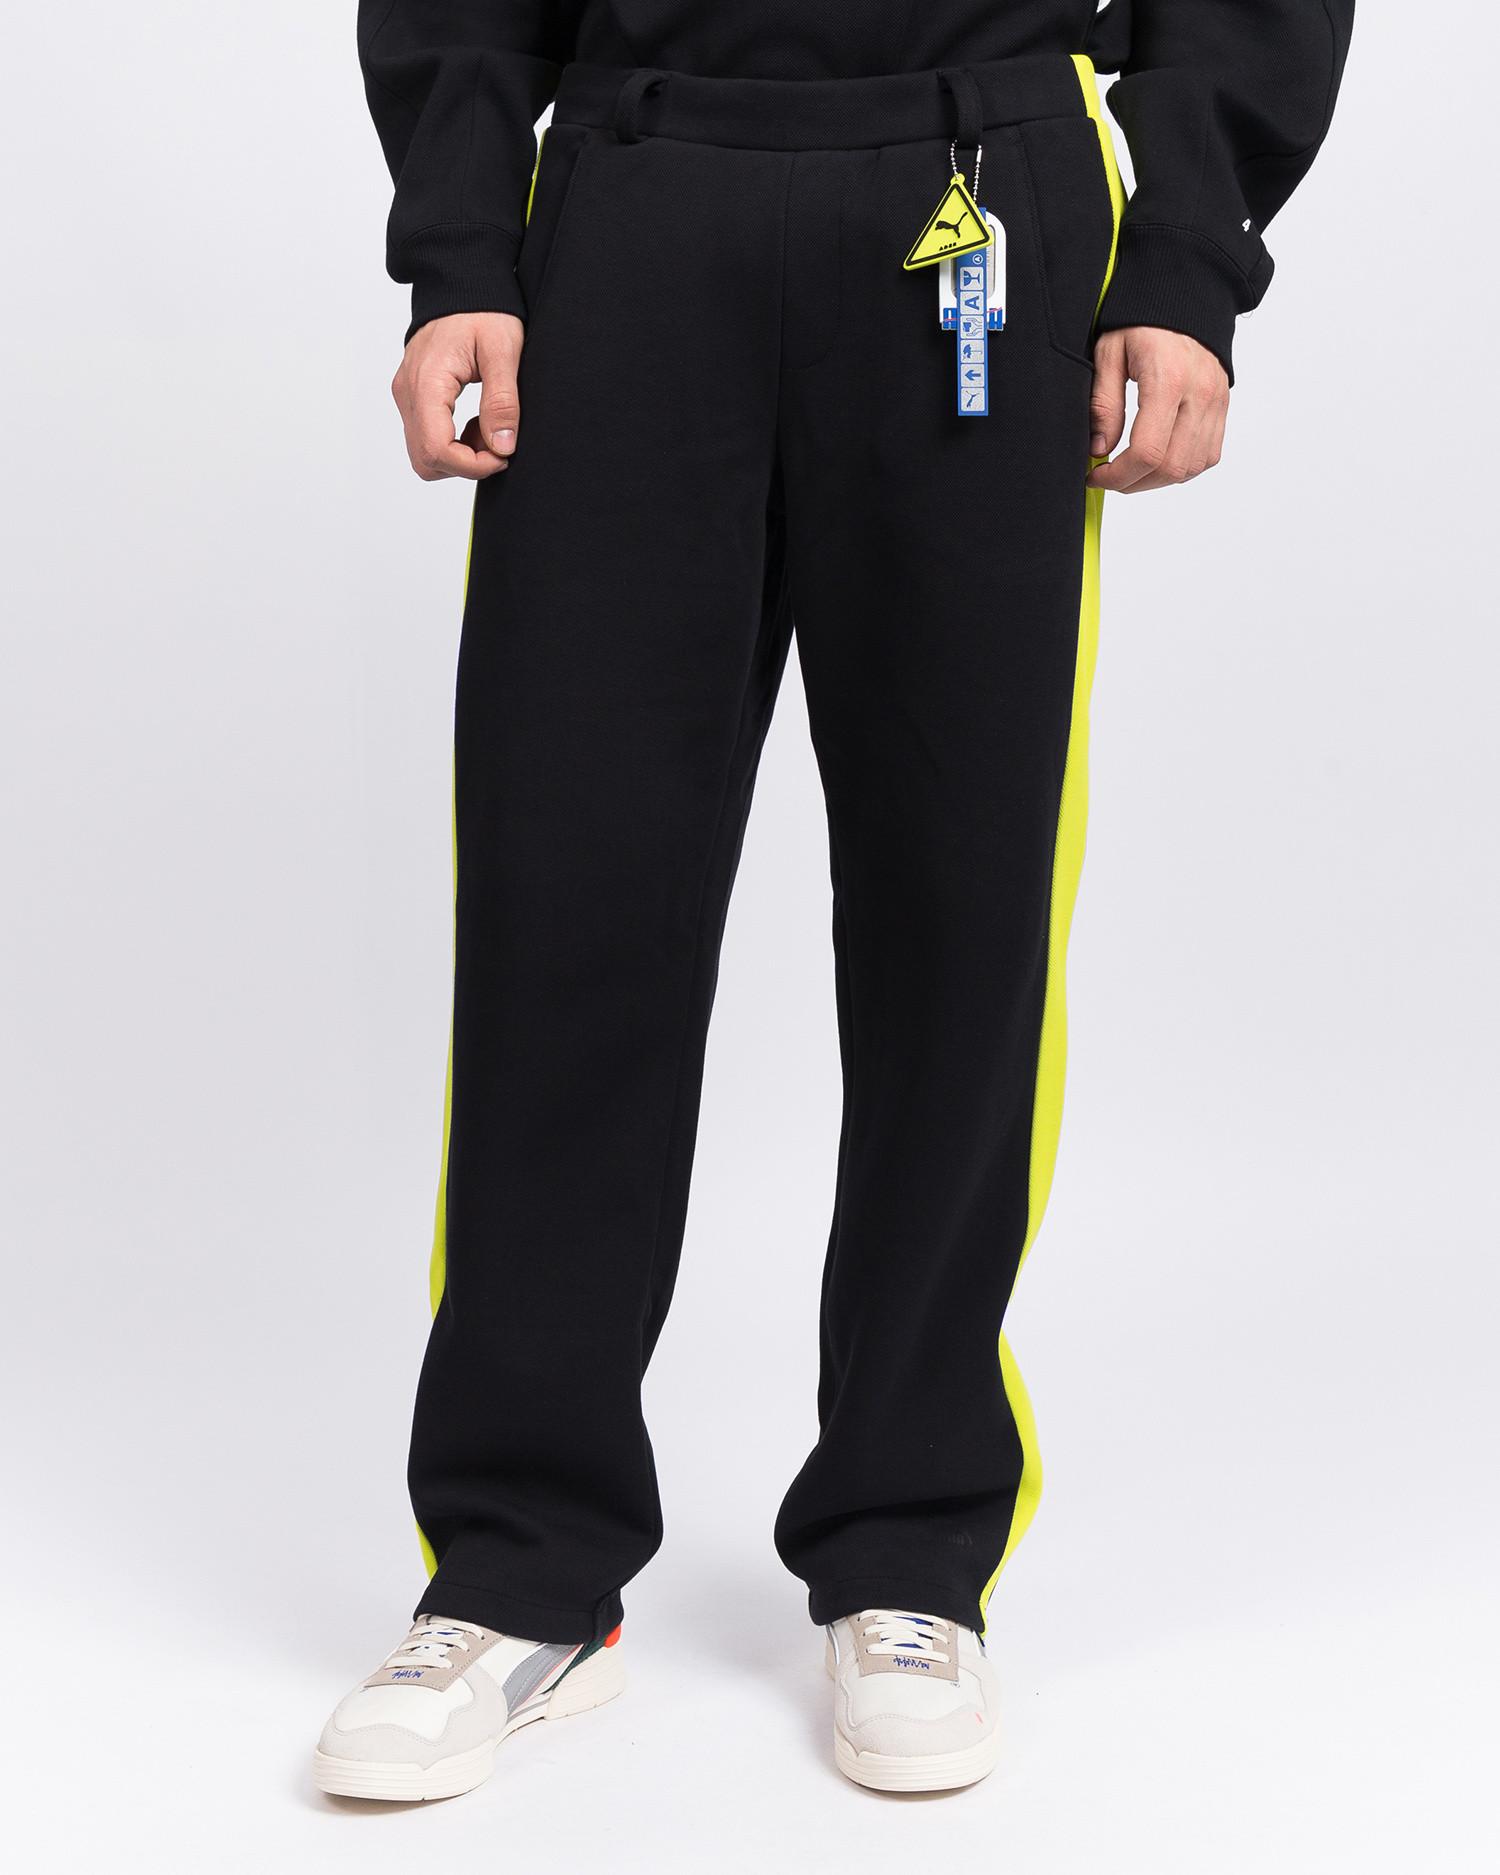 Puma X Ader Error T7 Overlay Pants Cotton Black